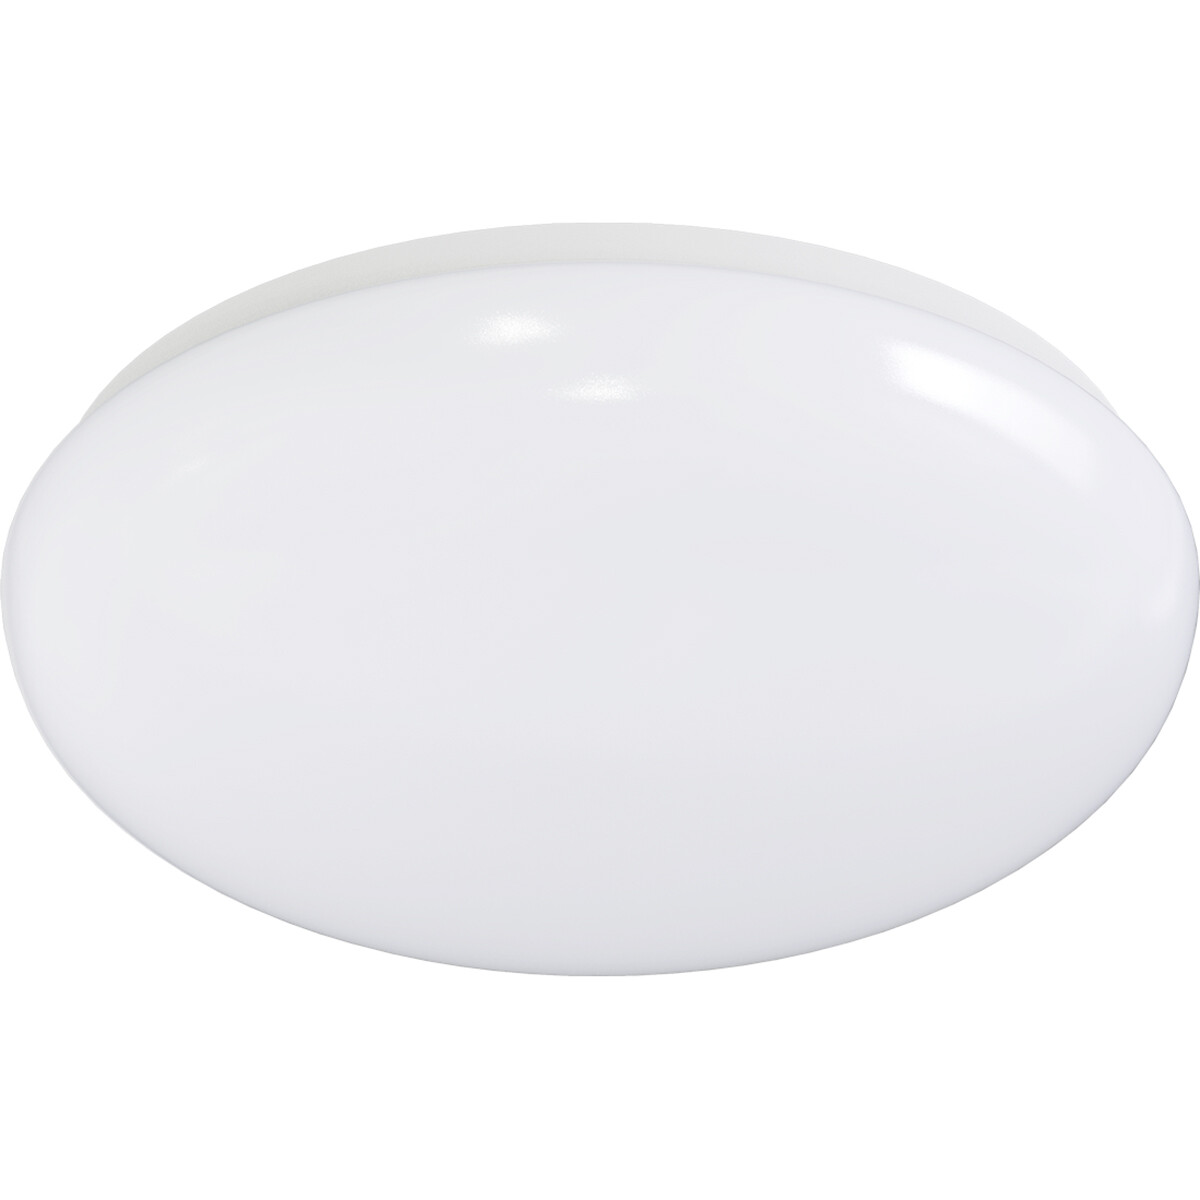 LED Plafondlamp - Aigi Monilo - Opbouw Rond - 24W - Aanpasbare Kleur - Mat Wit - Staal